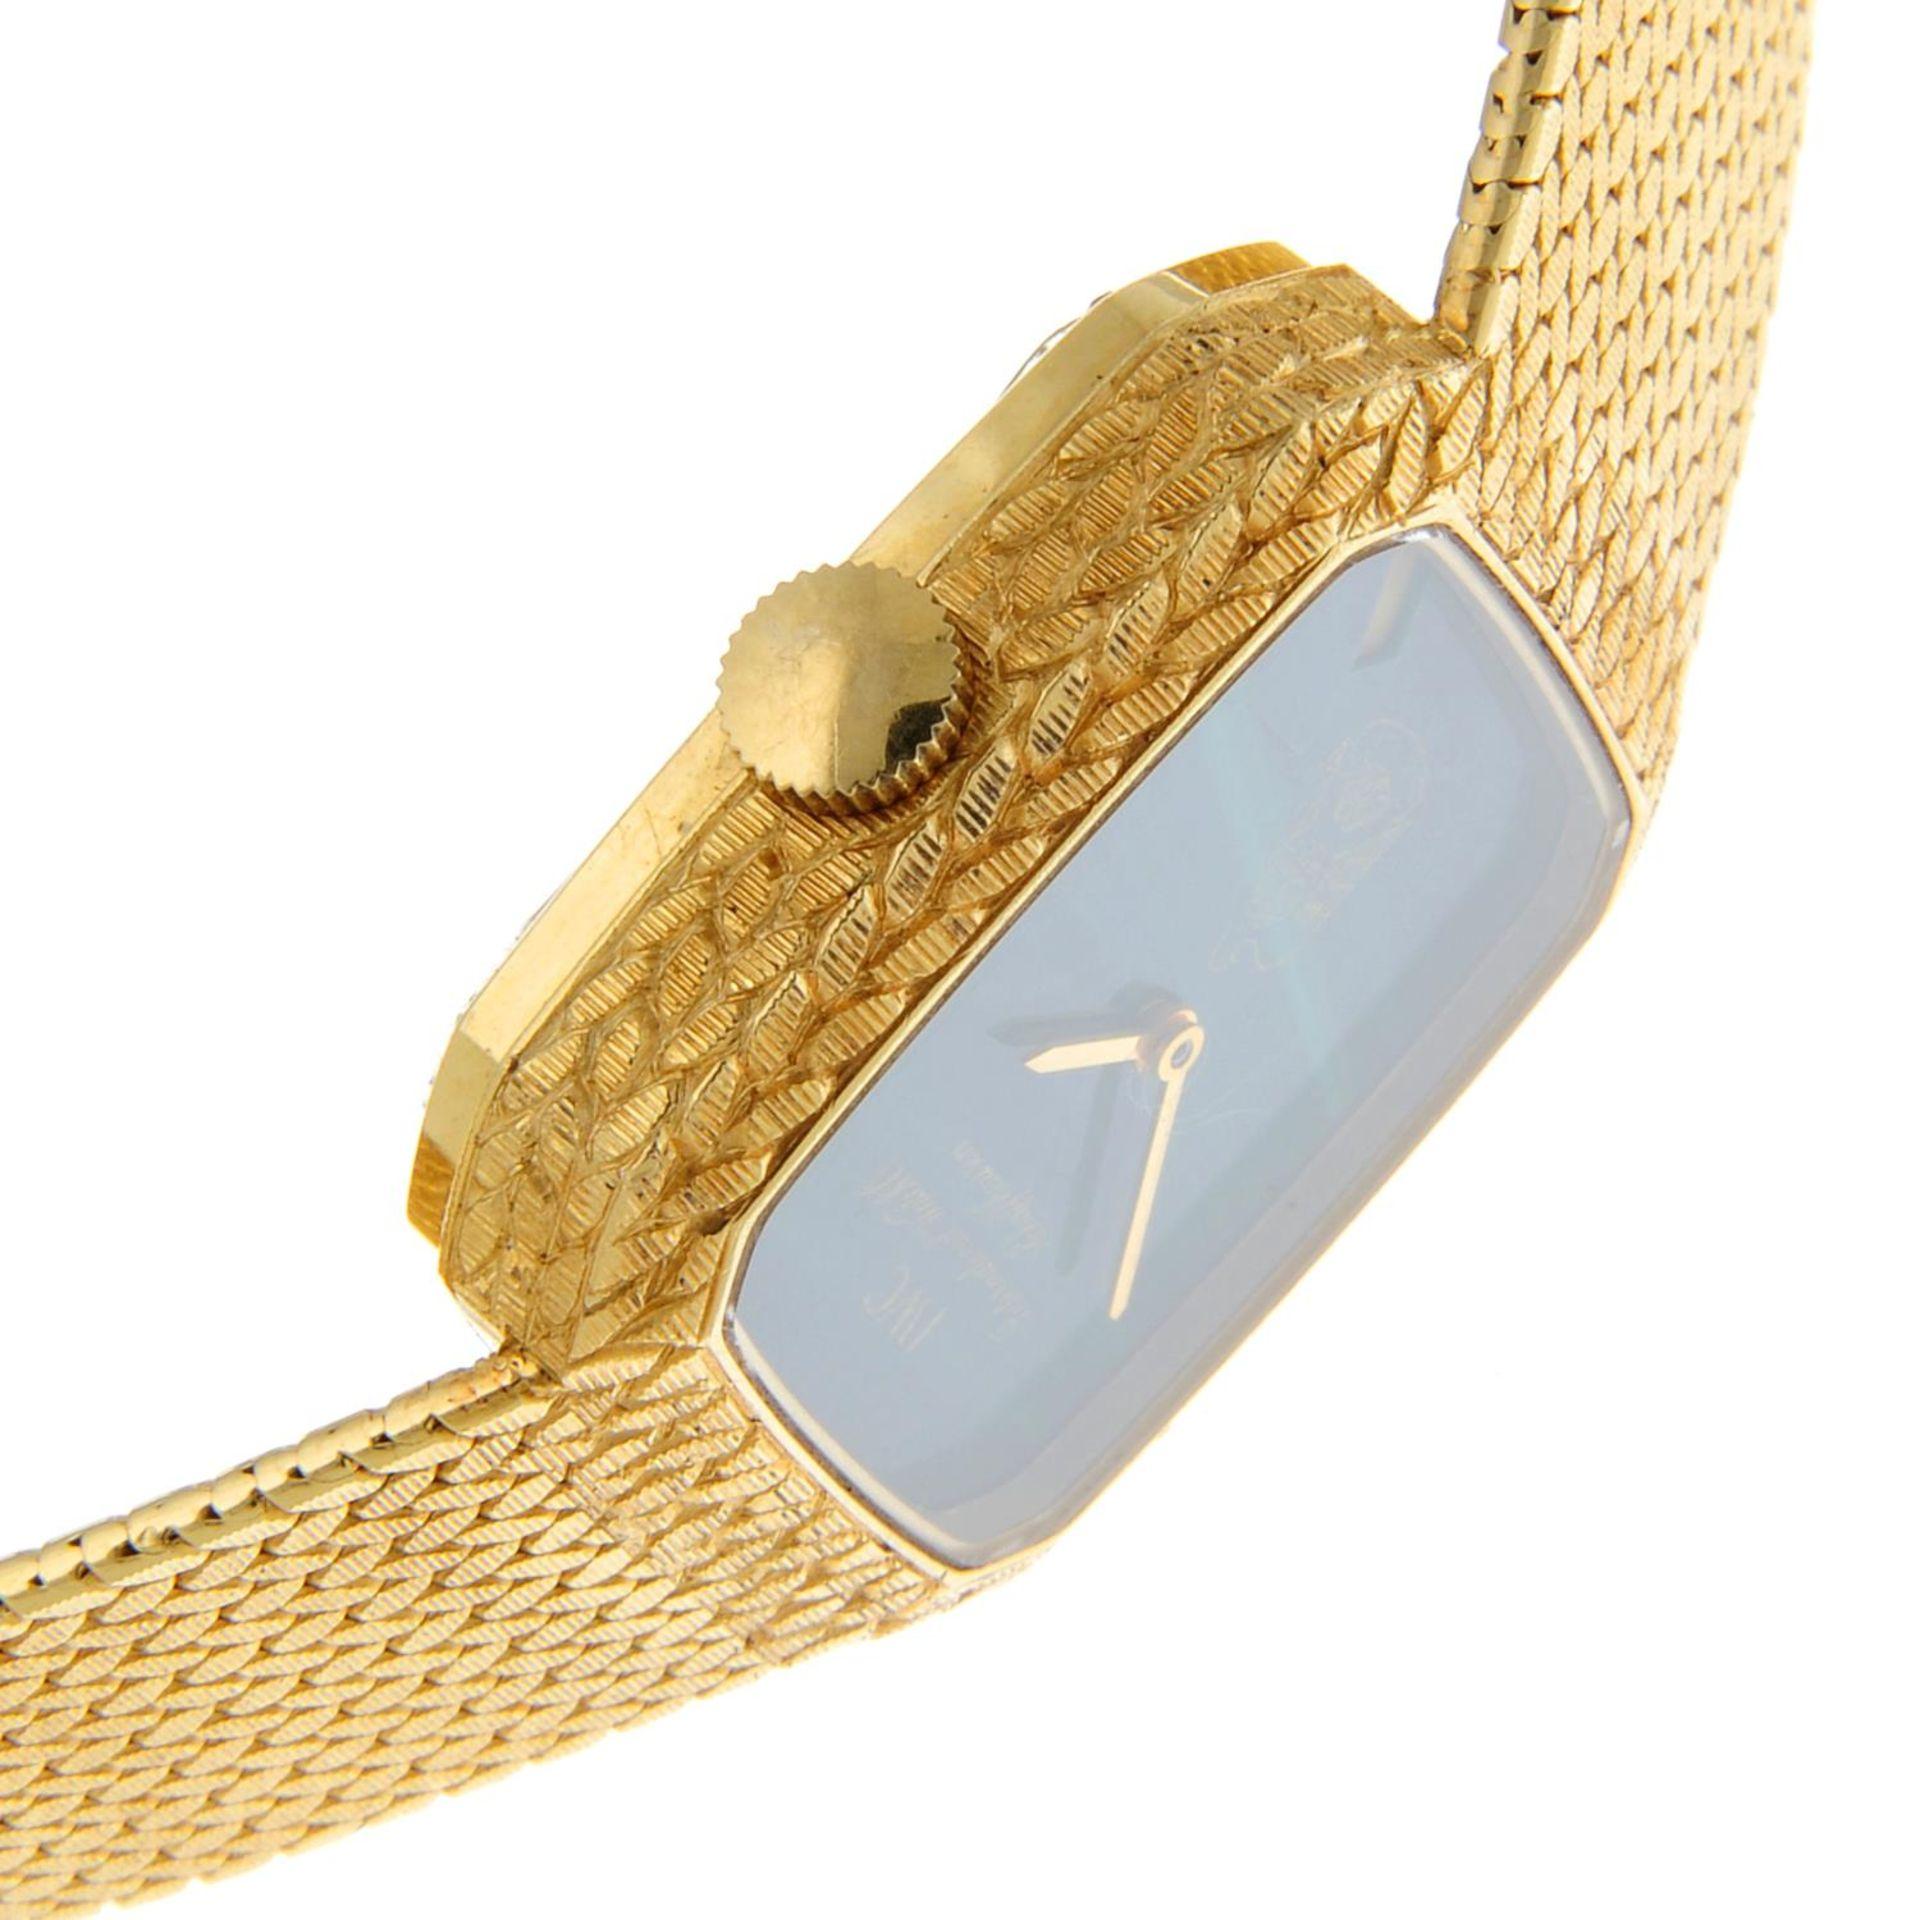 IWC - a bracelet watch. - Bild 4 aus 5